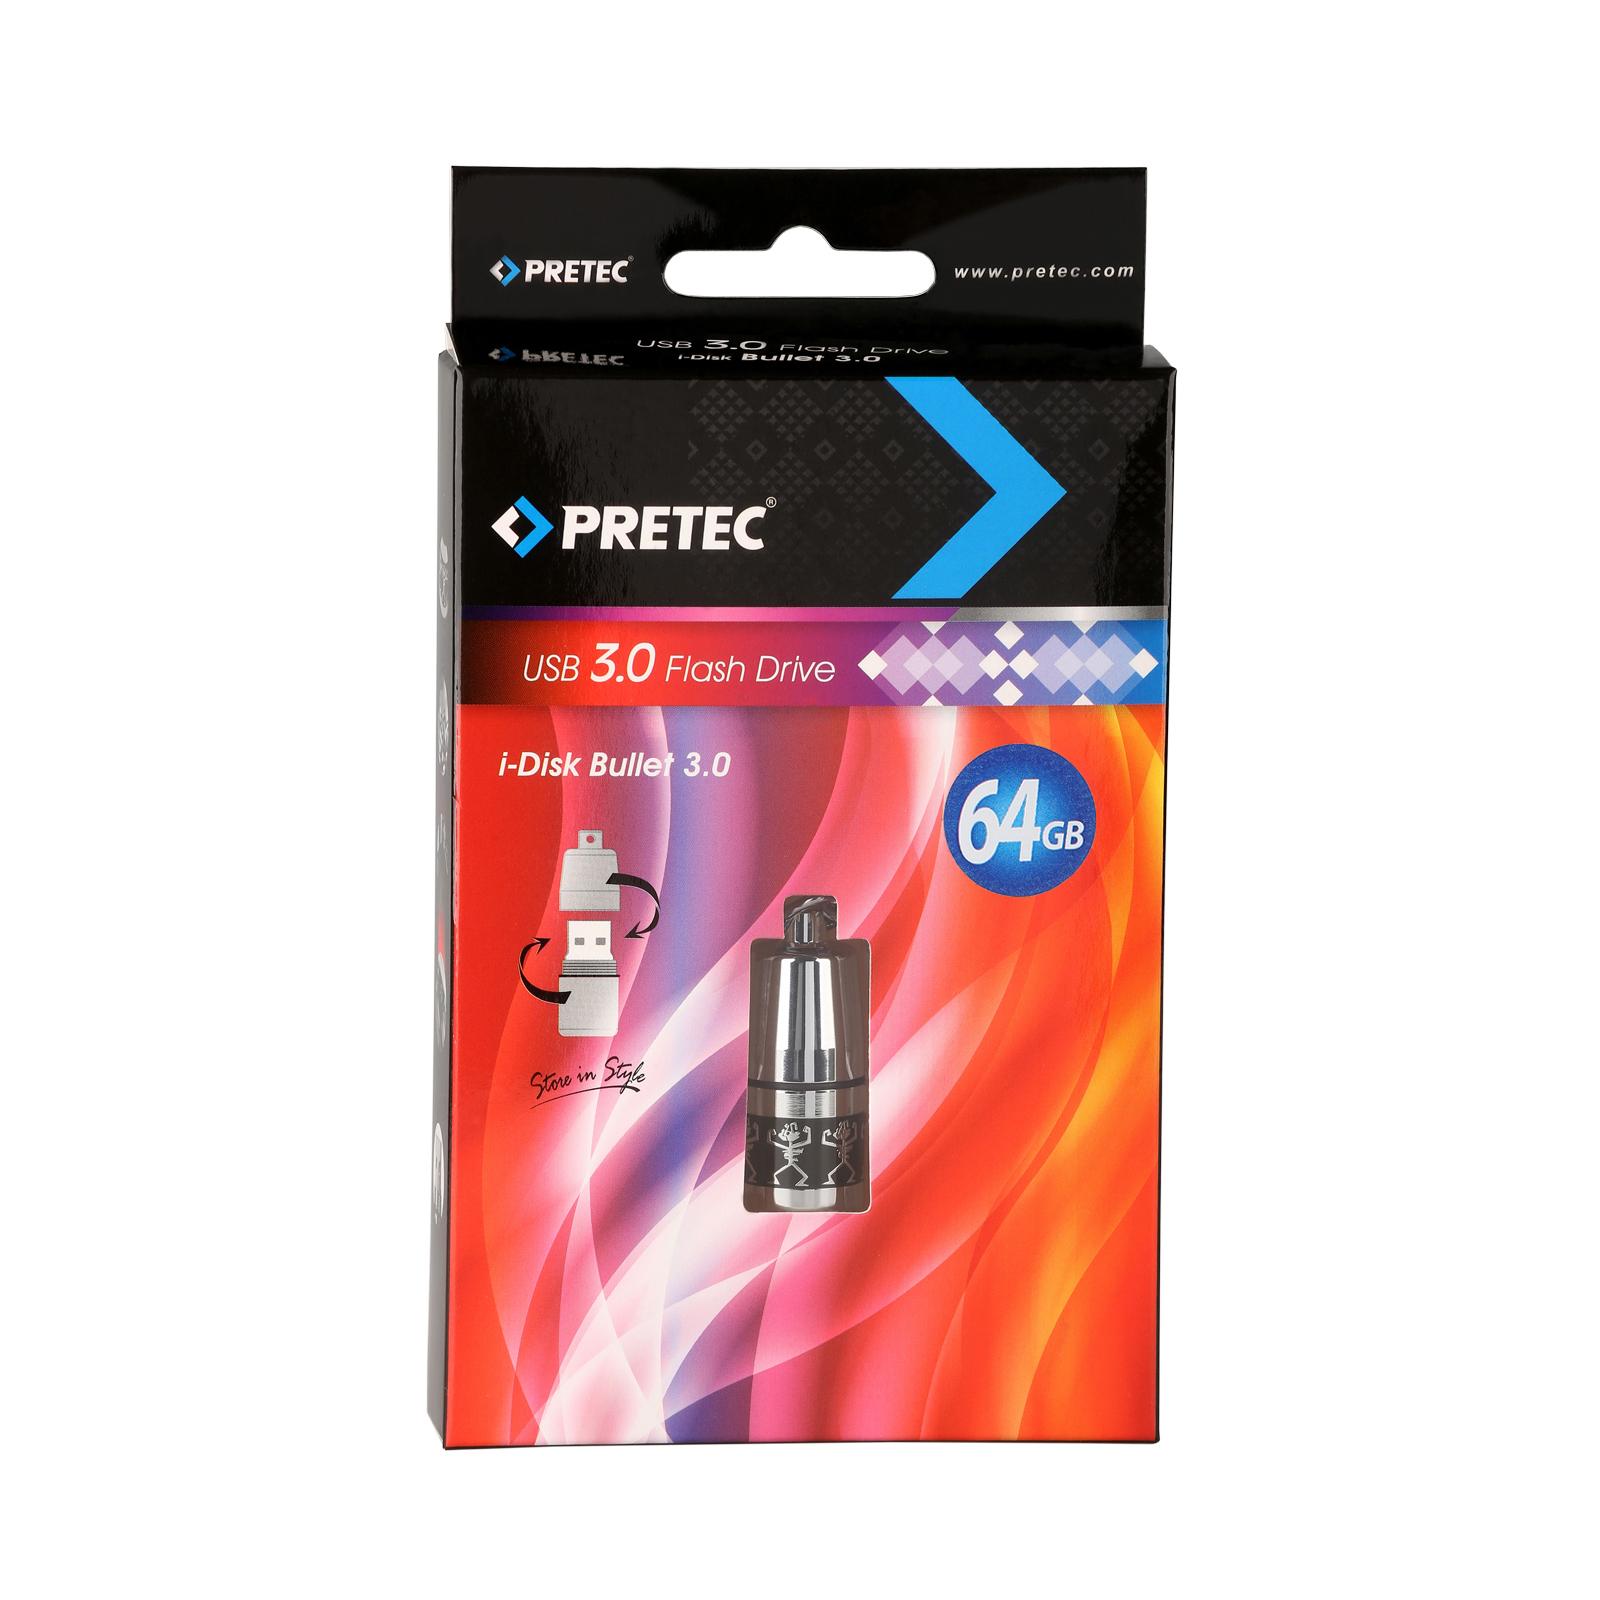 USB флеш накопитель Pretec 64GB i-Disk Bullet USB 2.0 (B2U64G-M) изображение 3